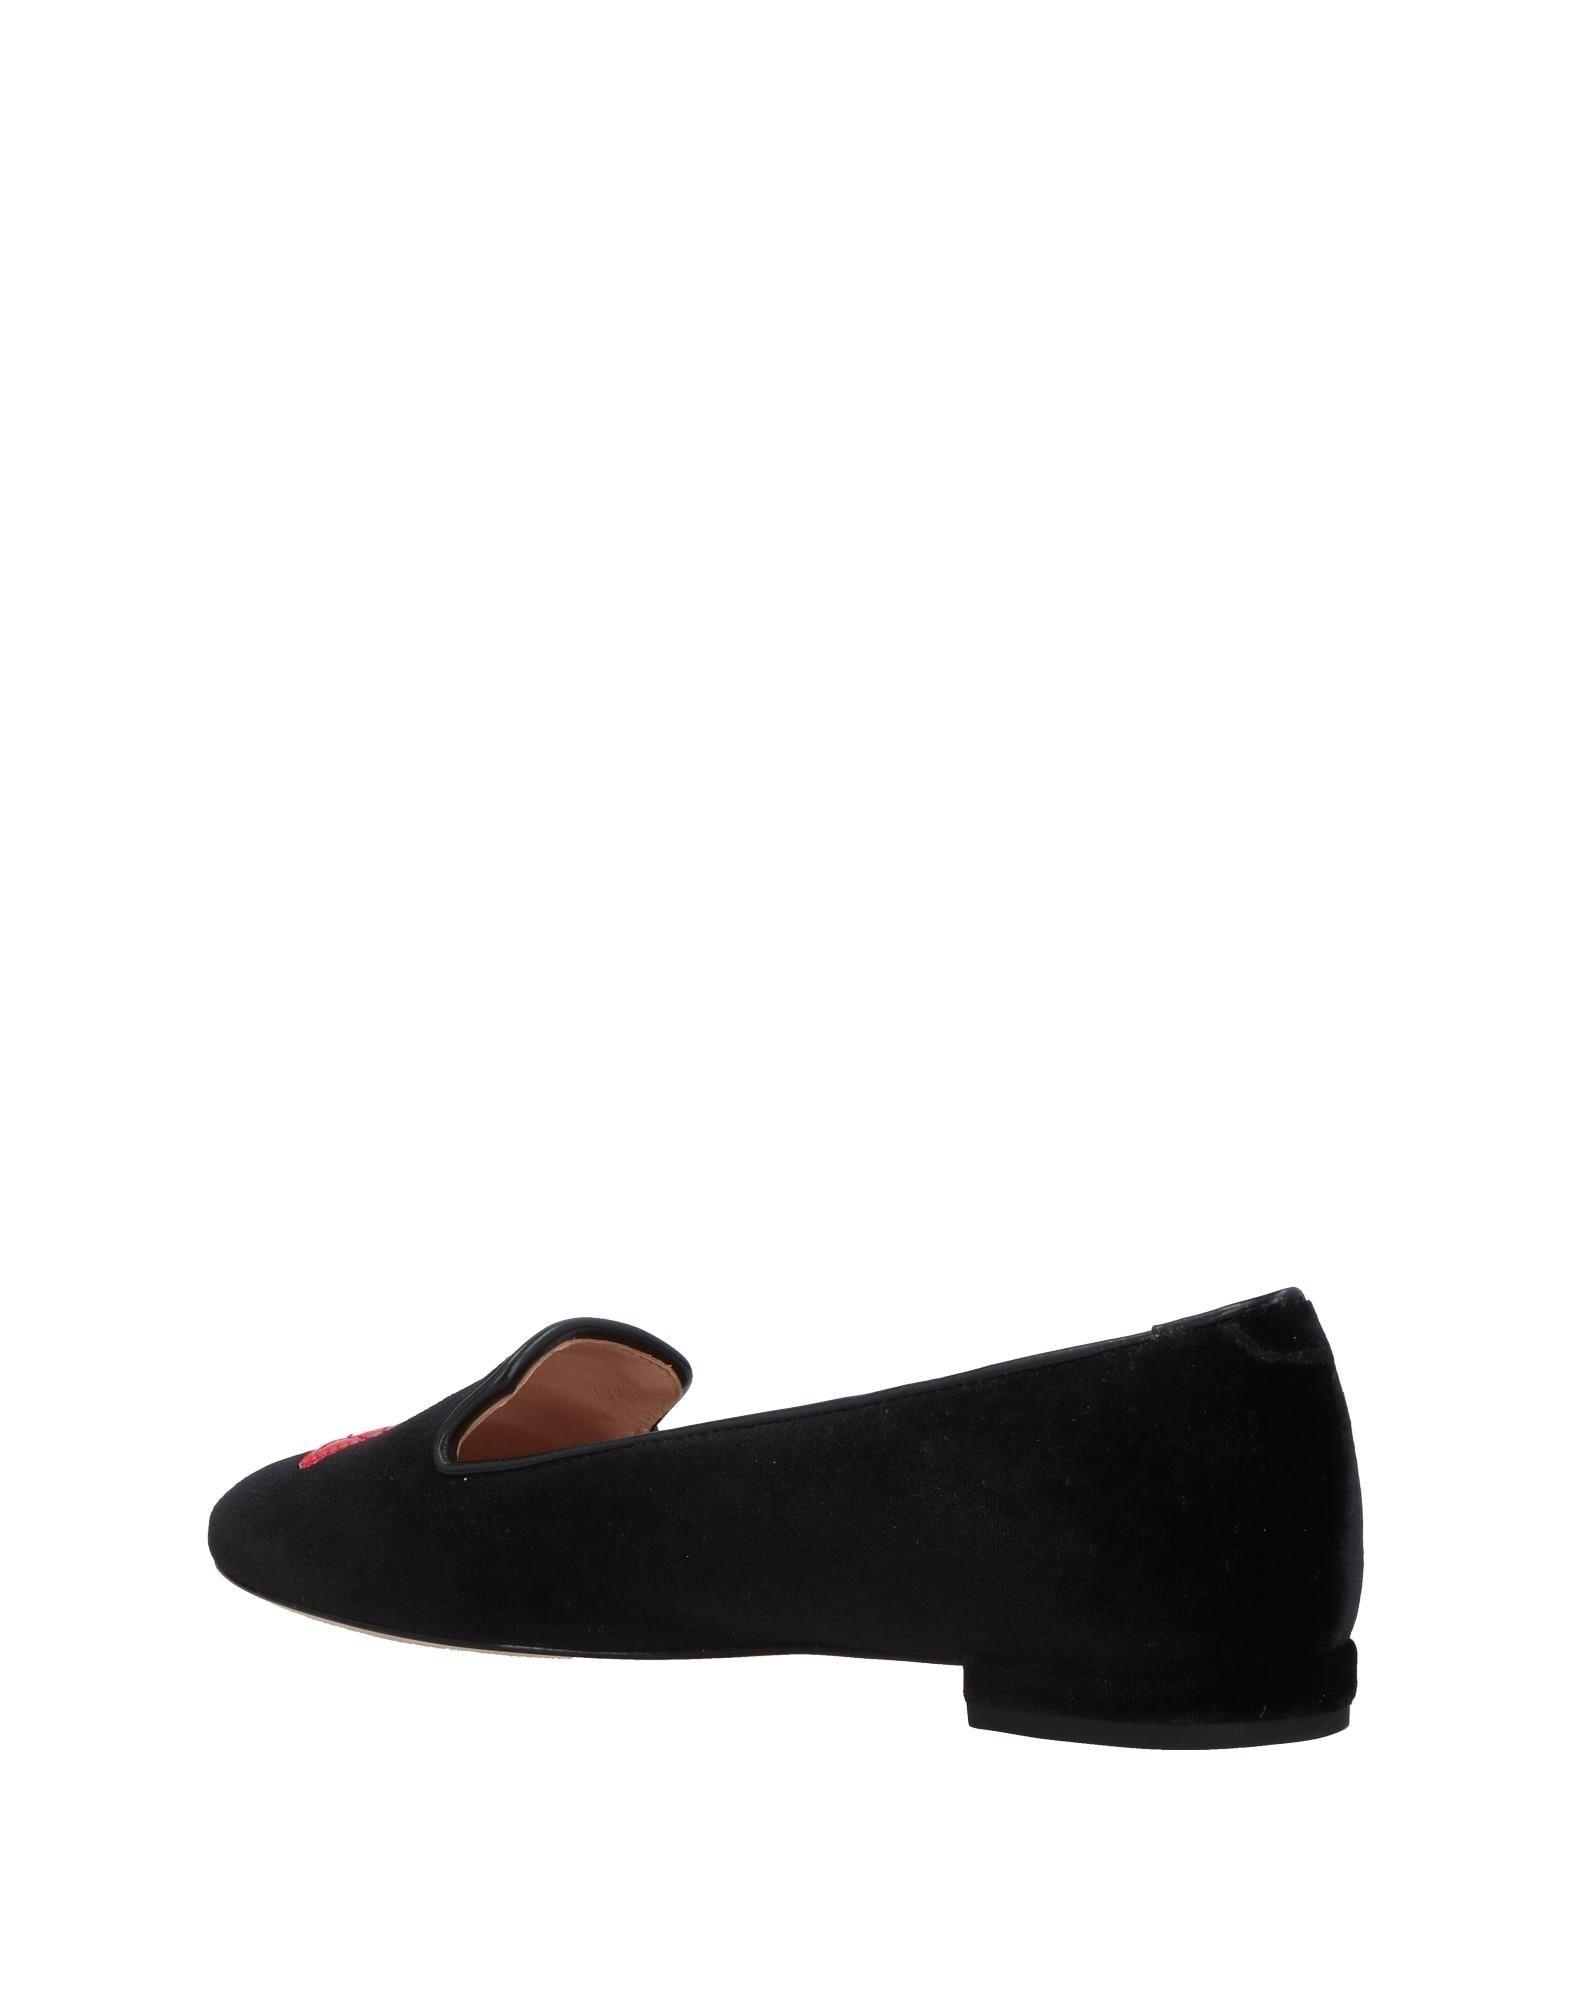 Stilvolle billige Schuhe Chiara Ferragni Ballerinas Damen  11395447SP